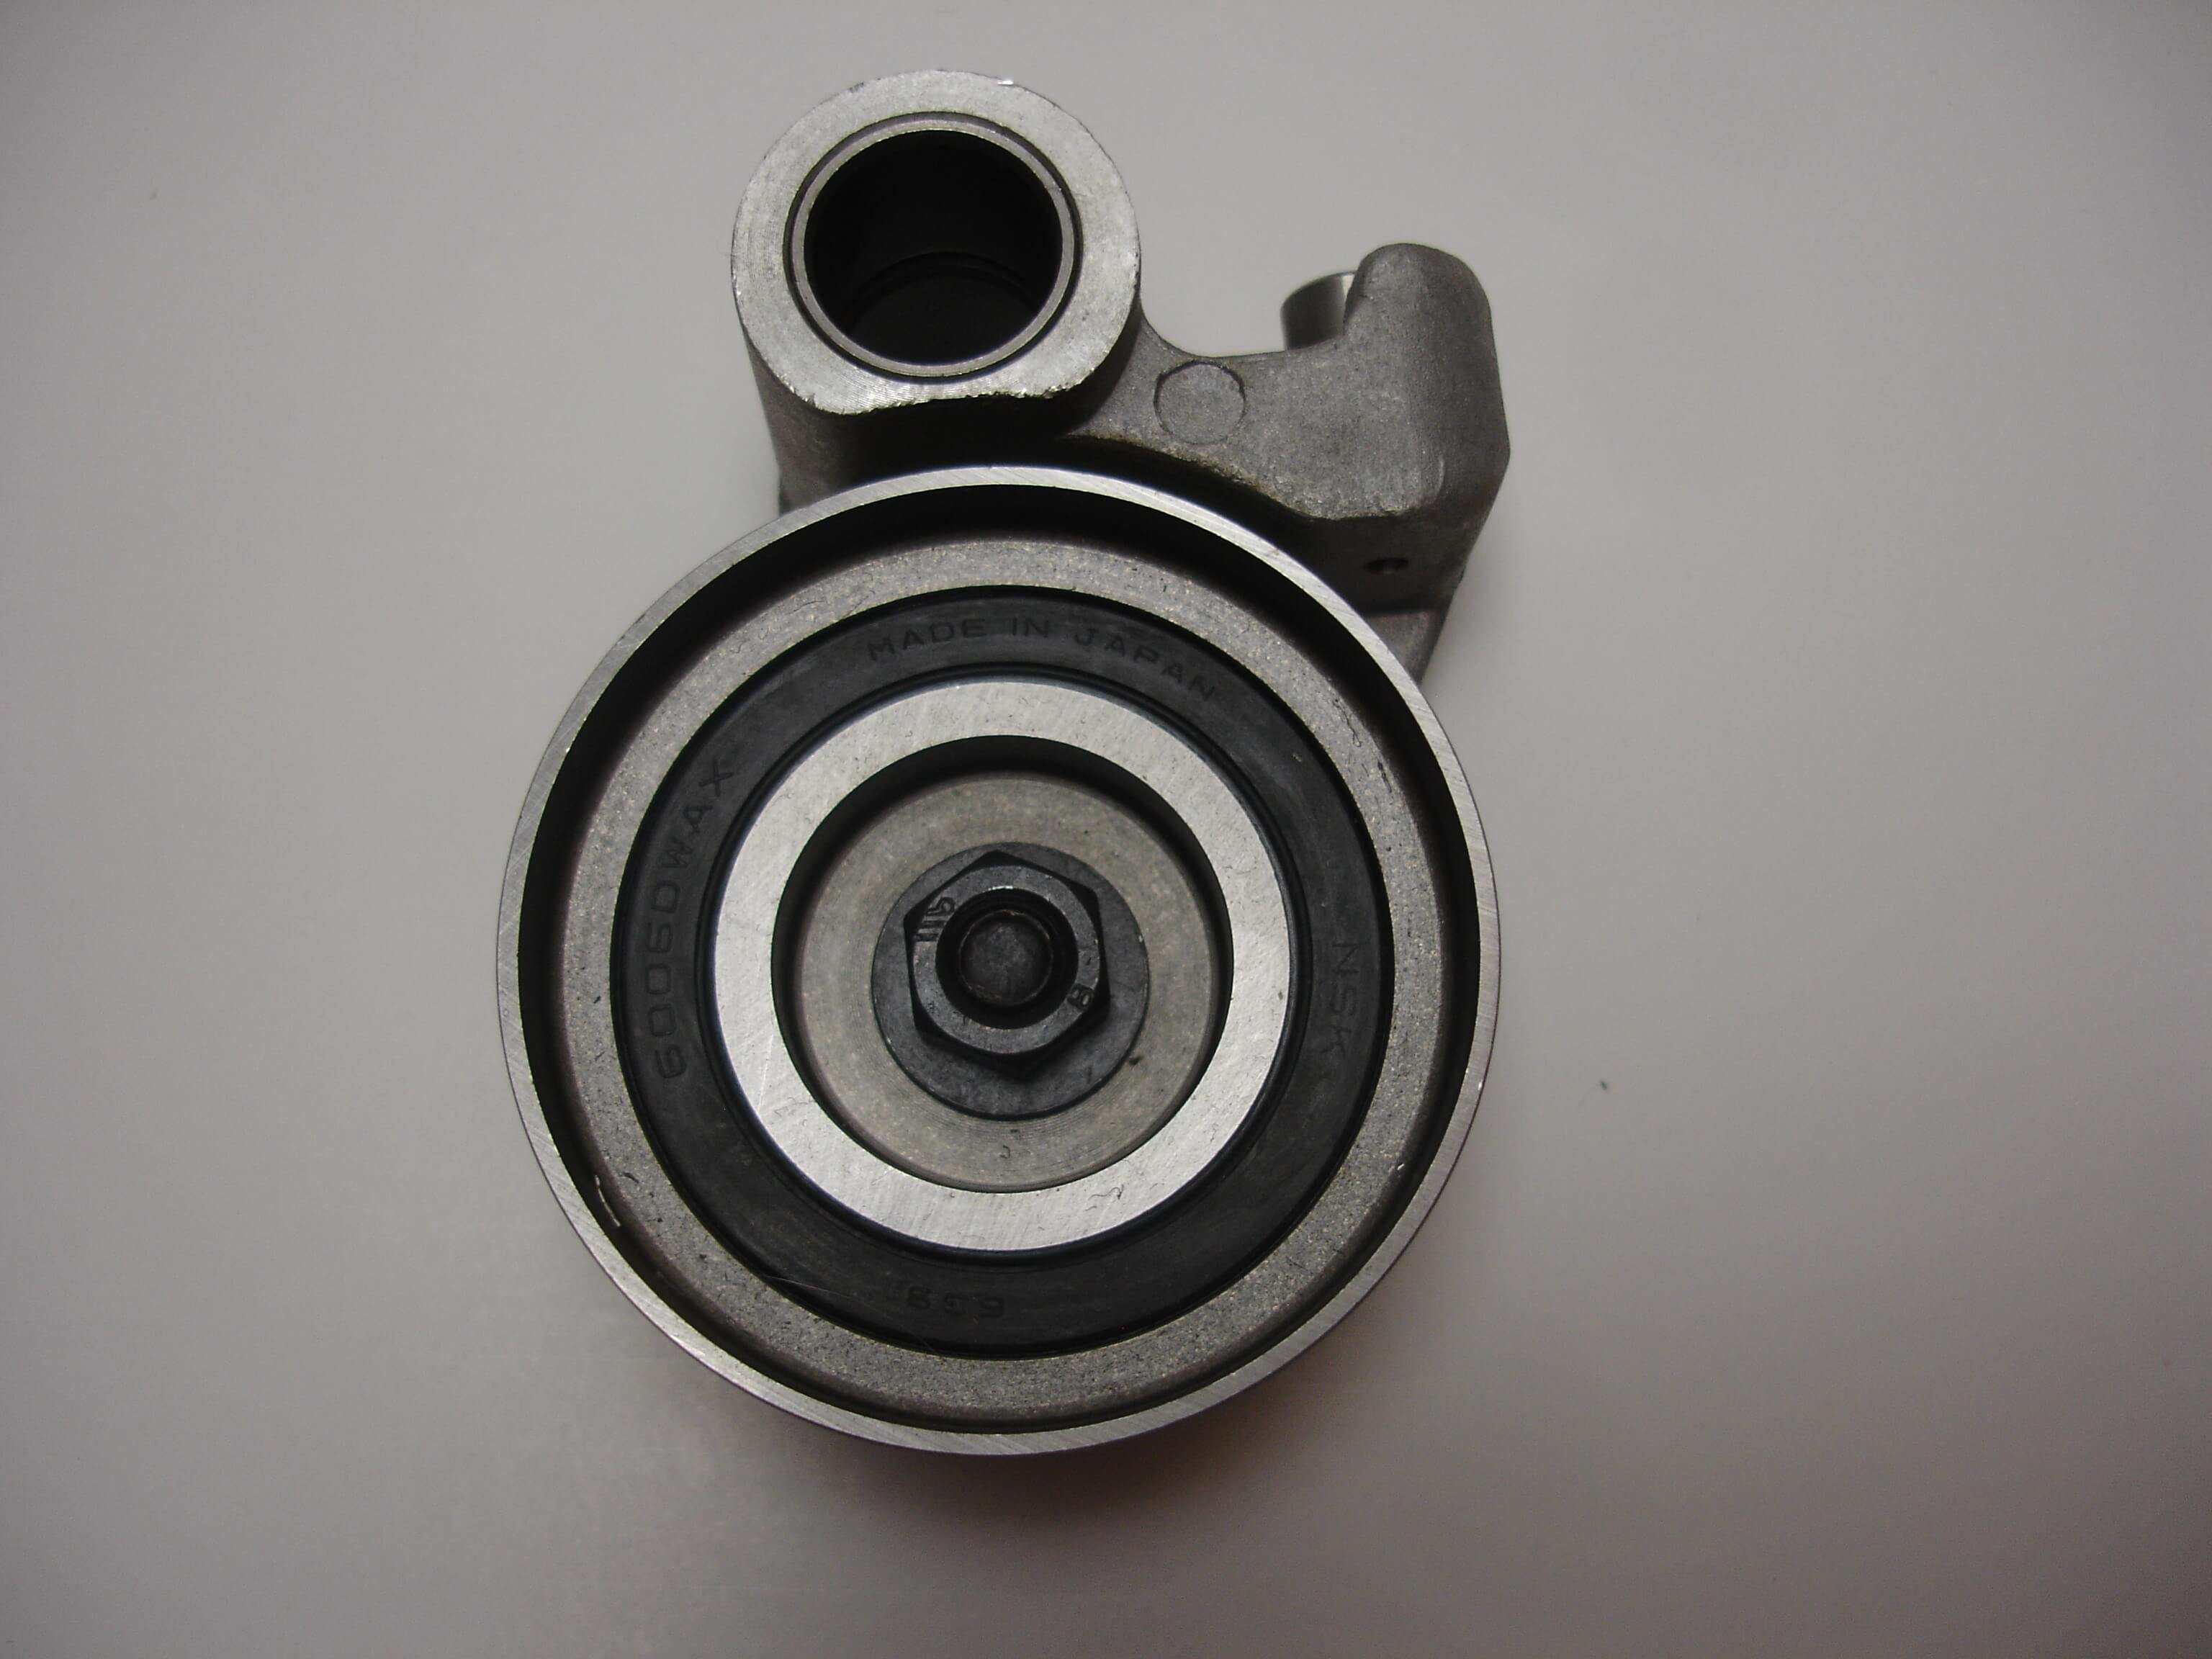 Toyota-OEM-1KD-FTV-and-2KD-FTV-and-1KZ-TE-Timing-Belt-idler-13505-0L010